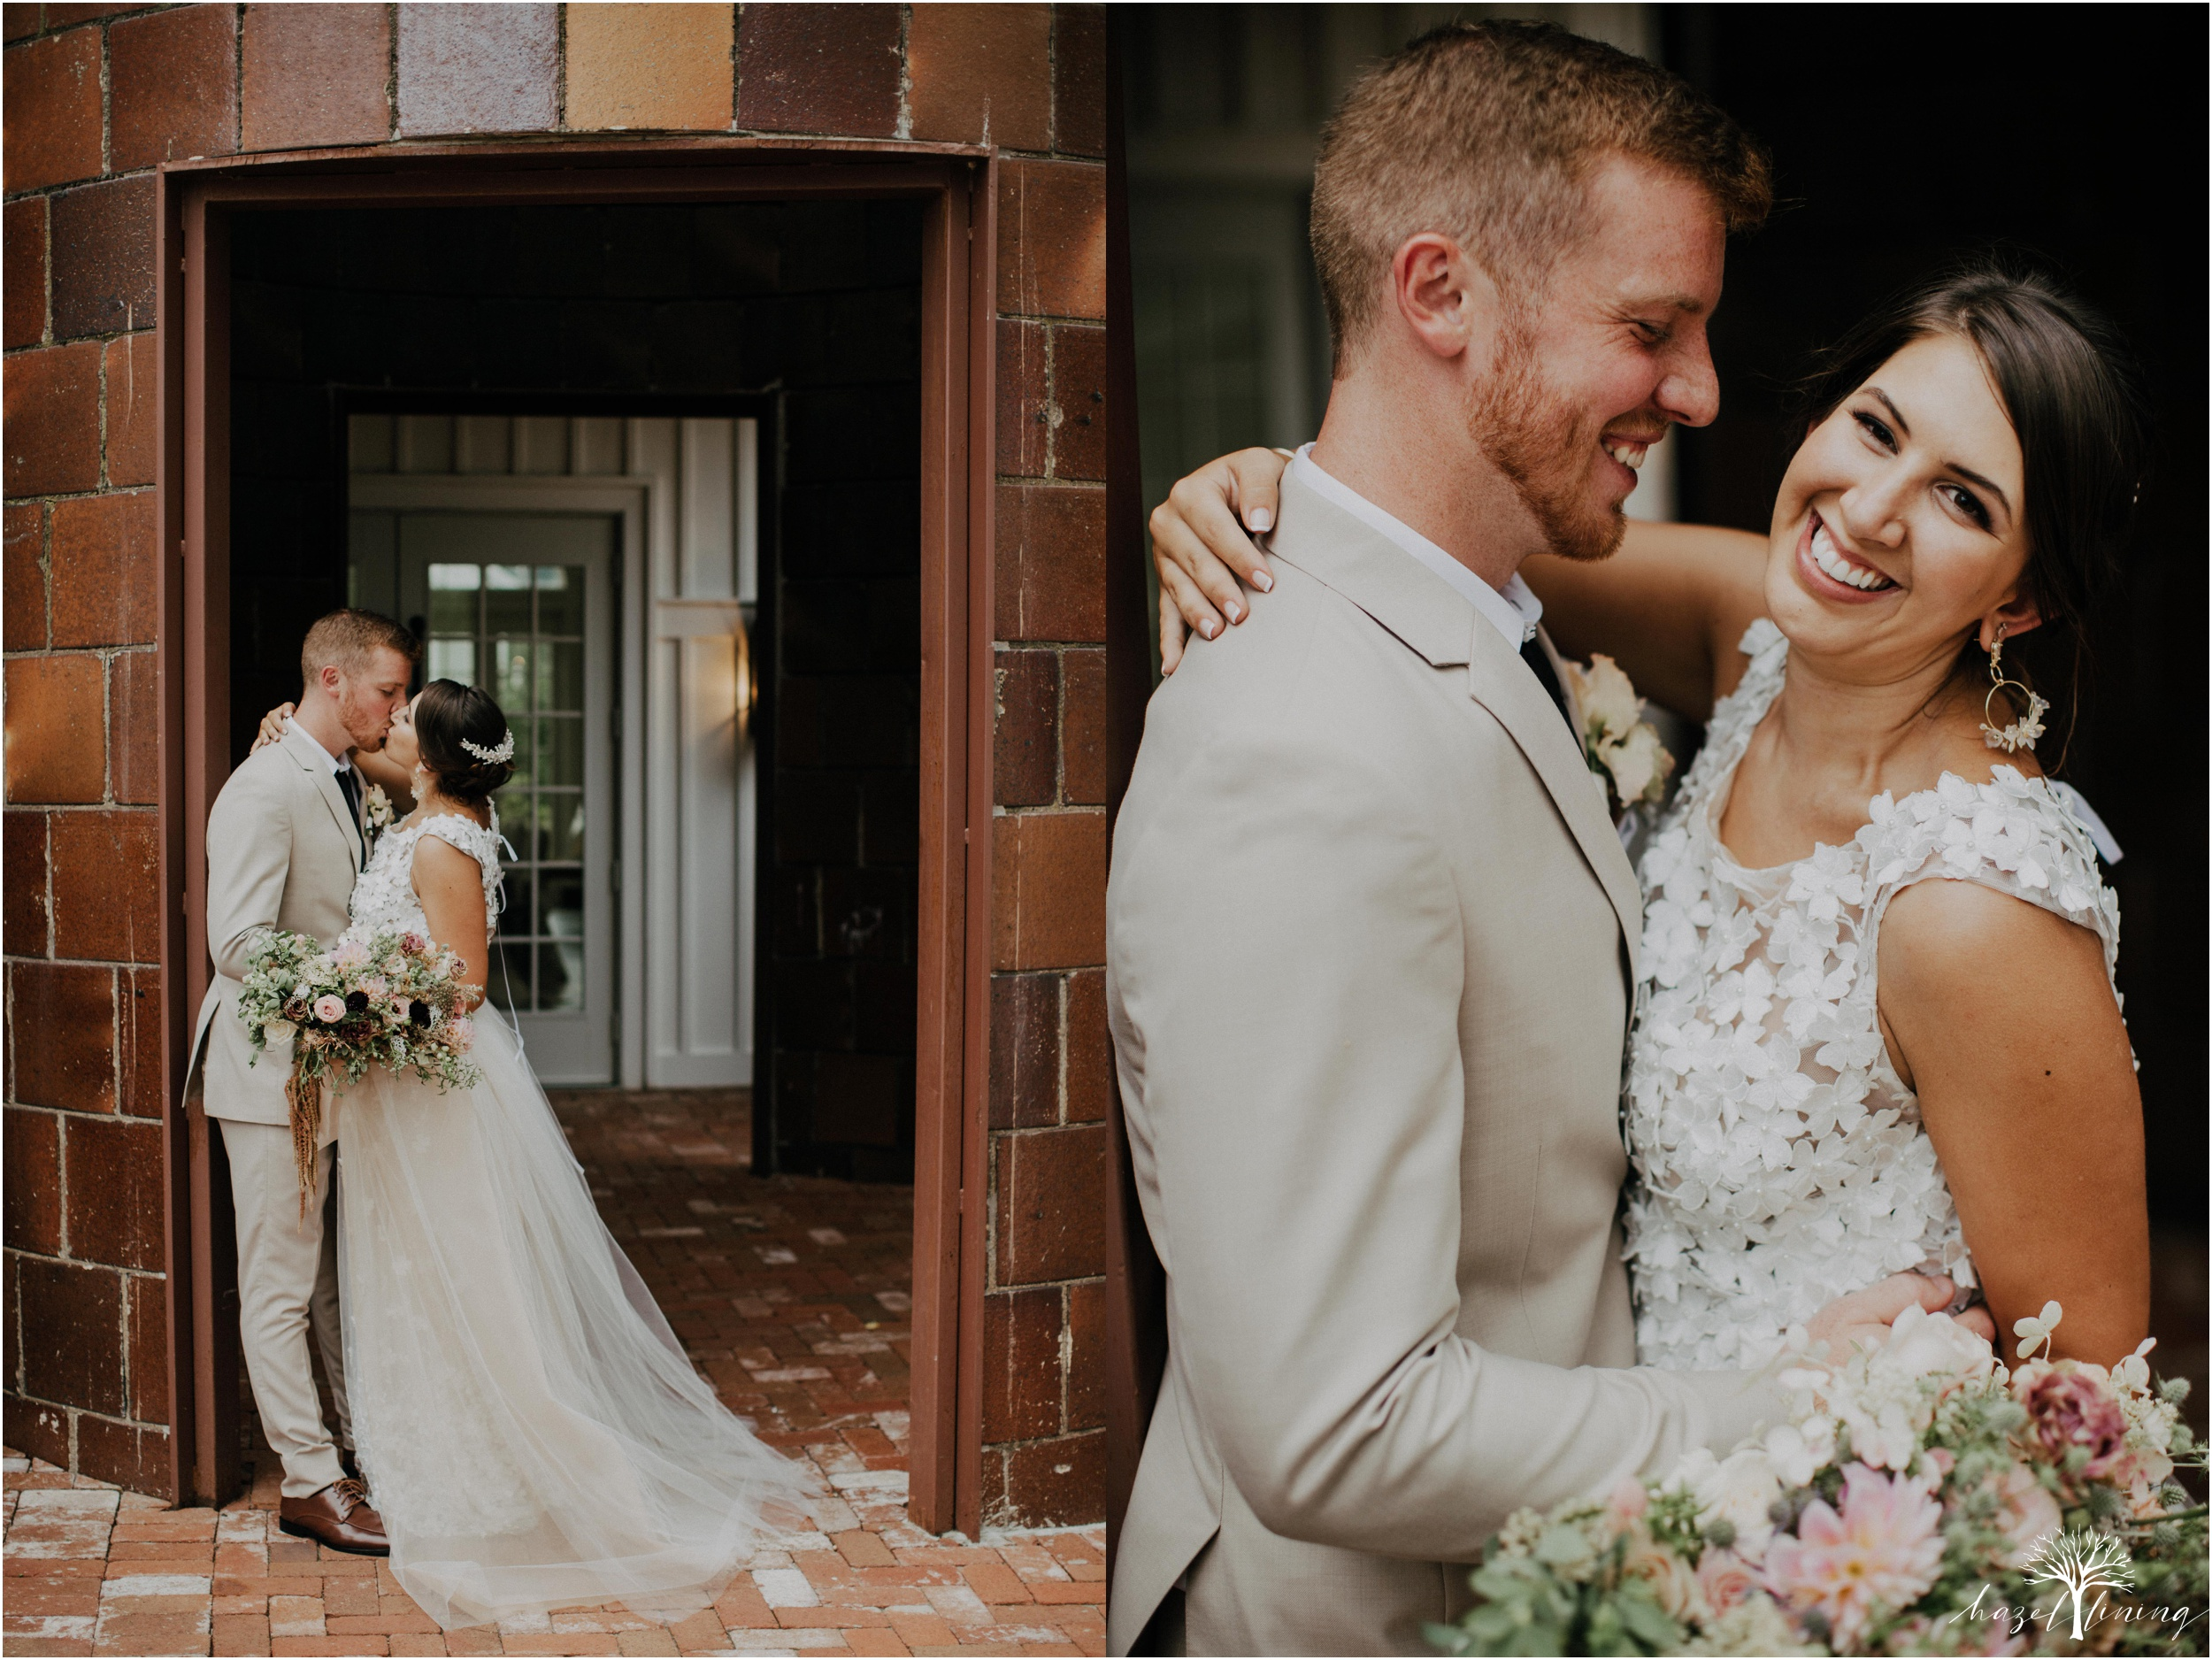 carl-chloe-the-ryland-inn-whitehouse-station-new-jersey-styled-squad-hazel-lining-photography-destination-elopement-wedding-engagement-photography_0016.jpg